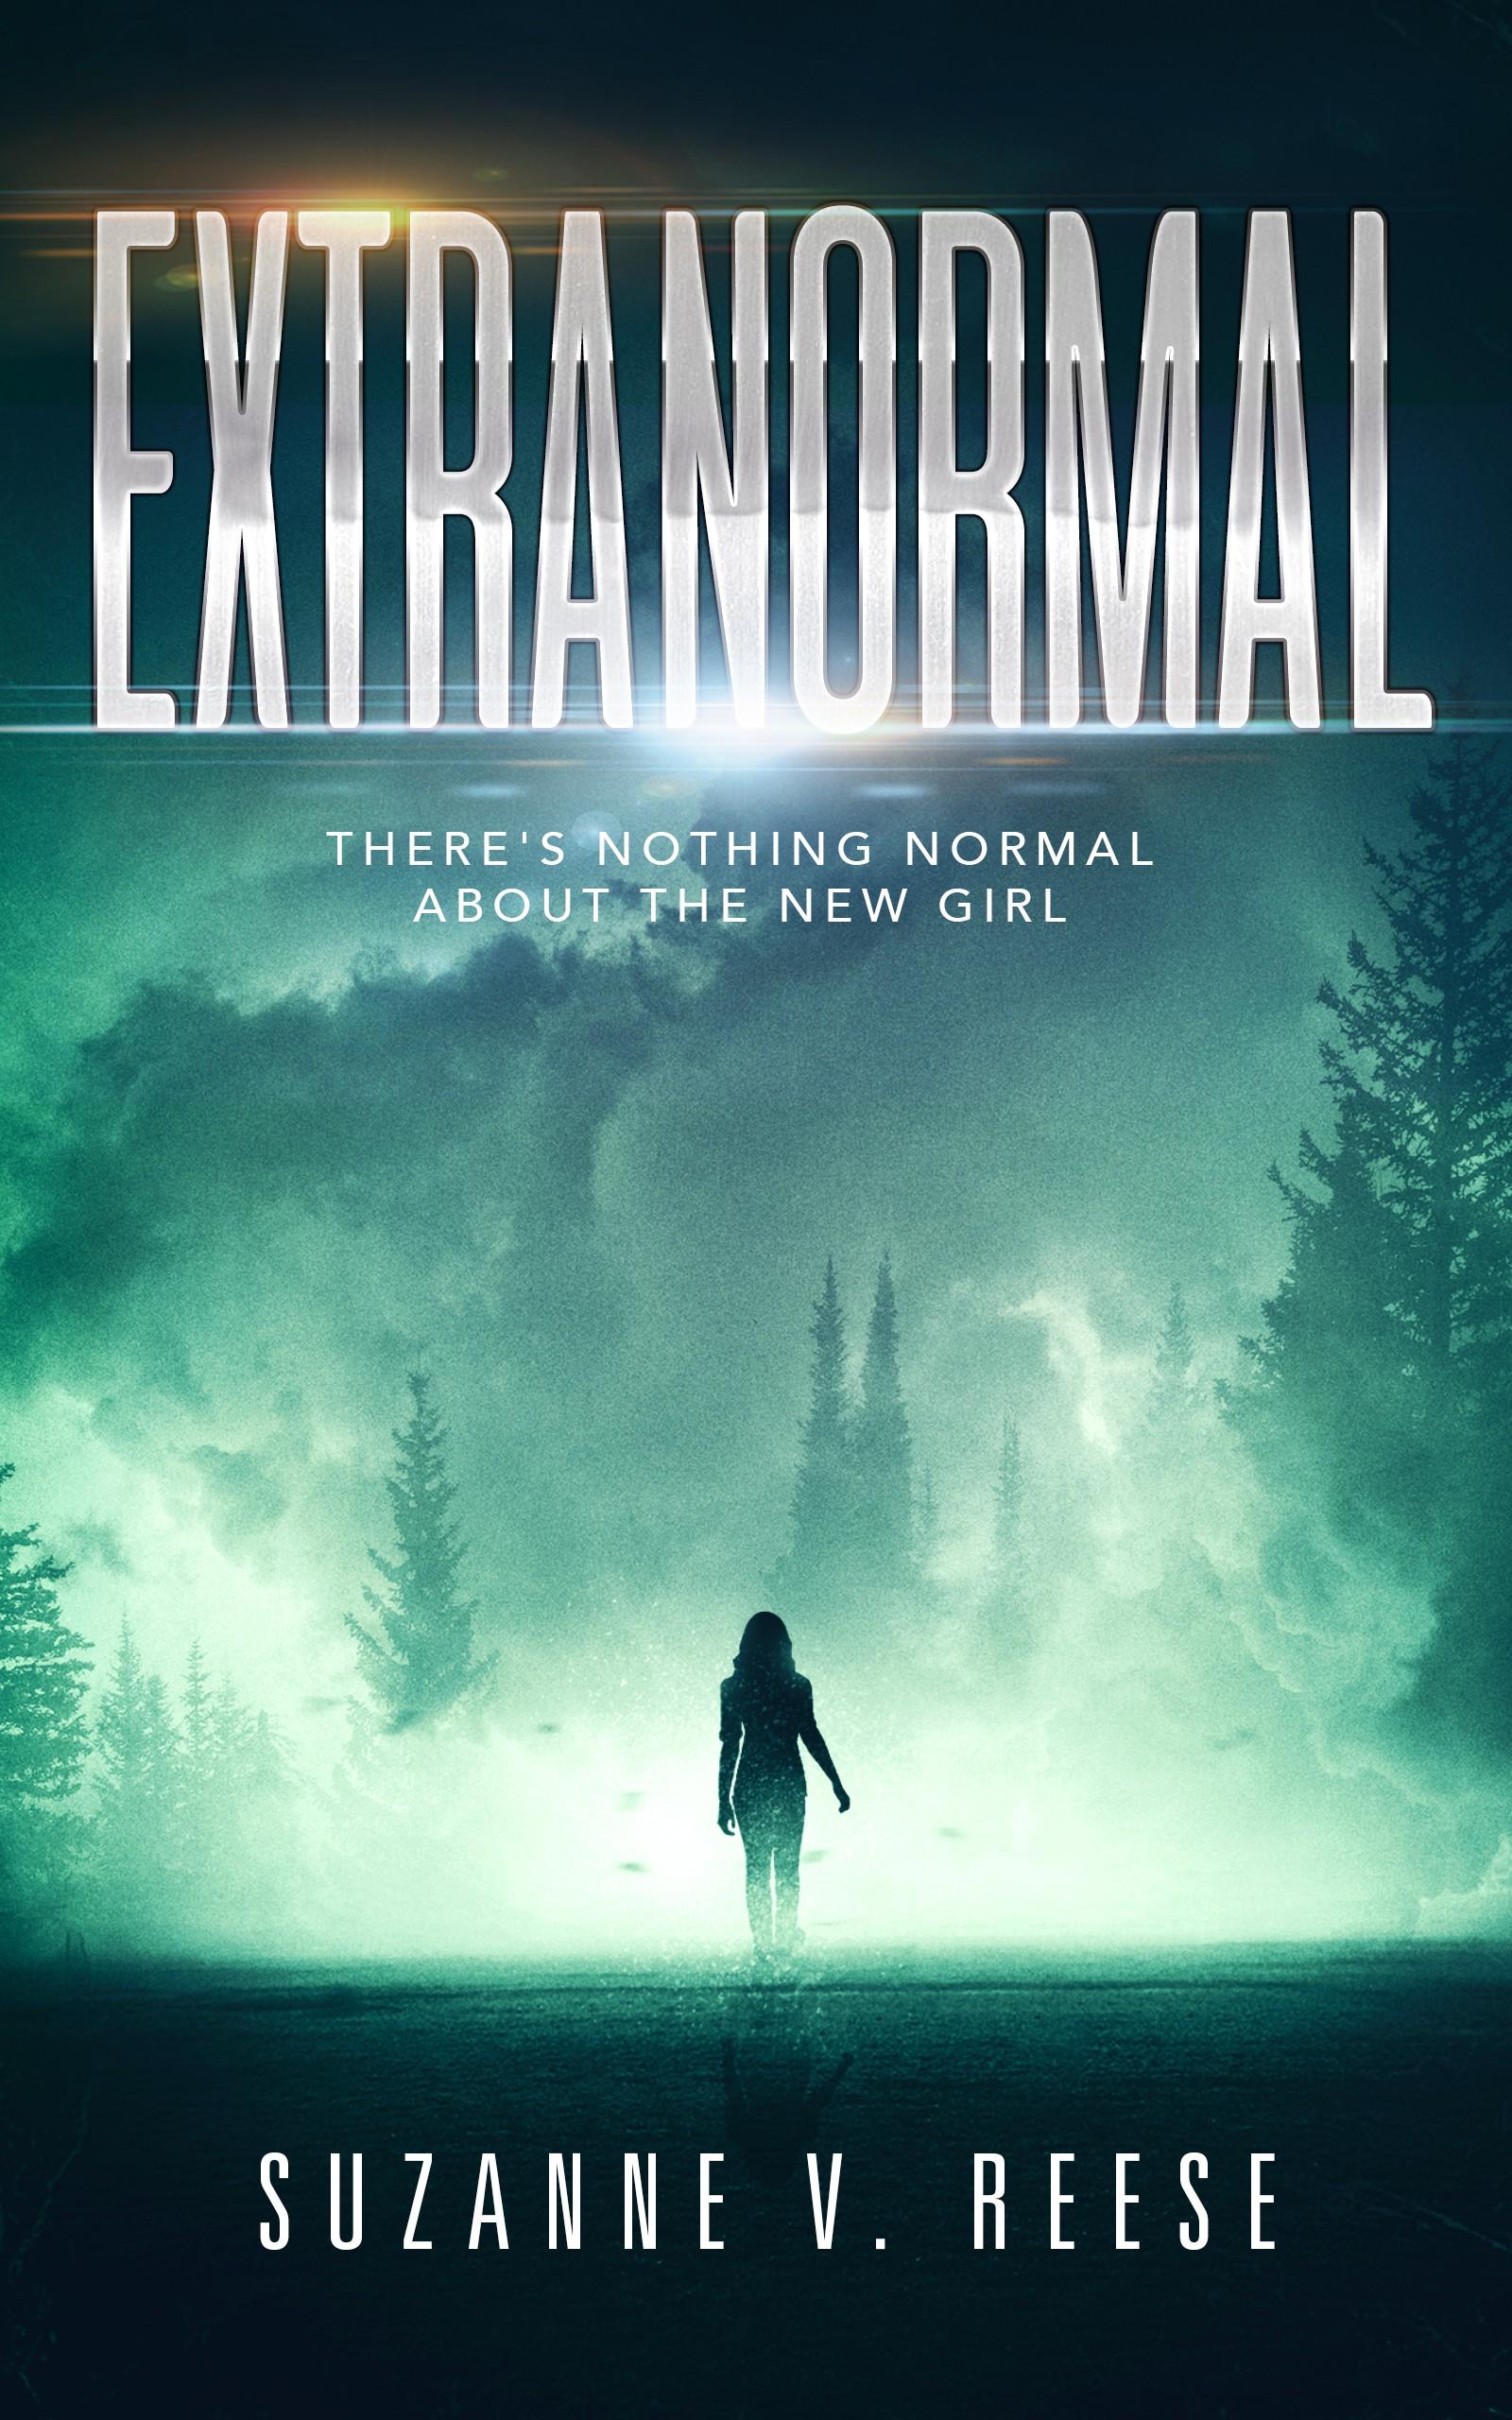 ExtraNormal Cover Design